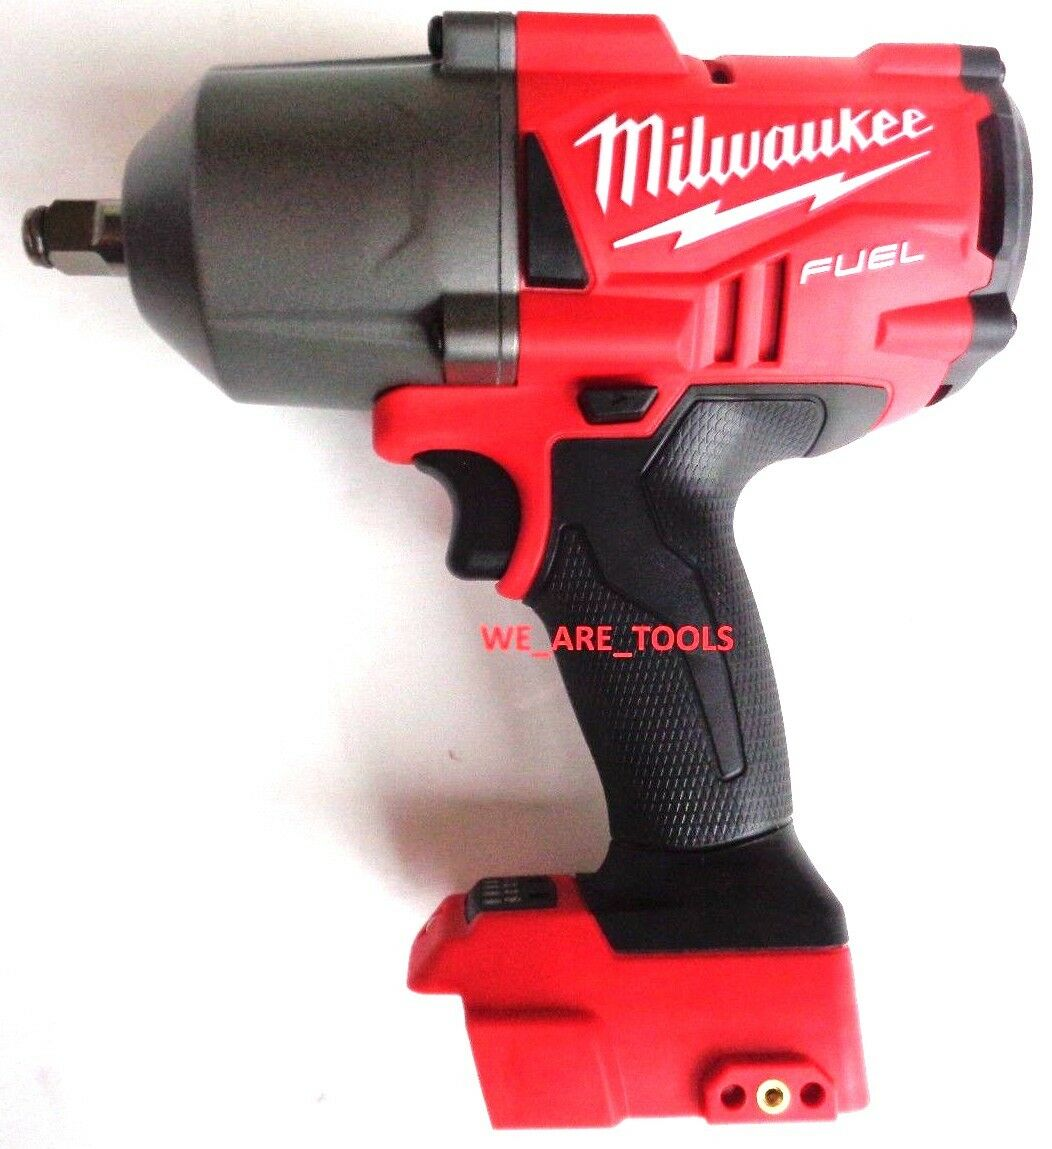 New Milwaukee FUEL 2767-20 18V 1/2